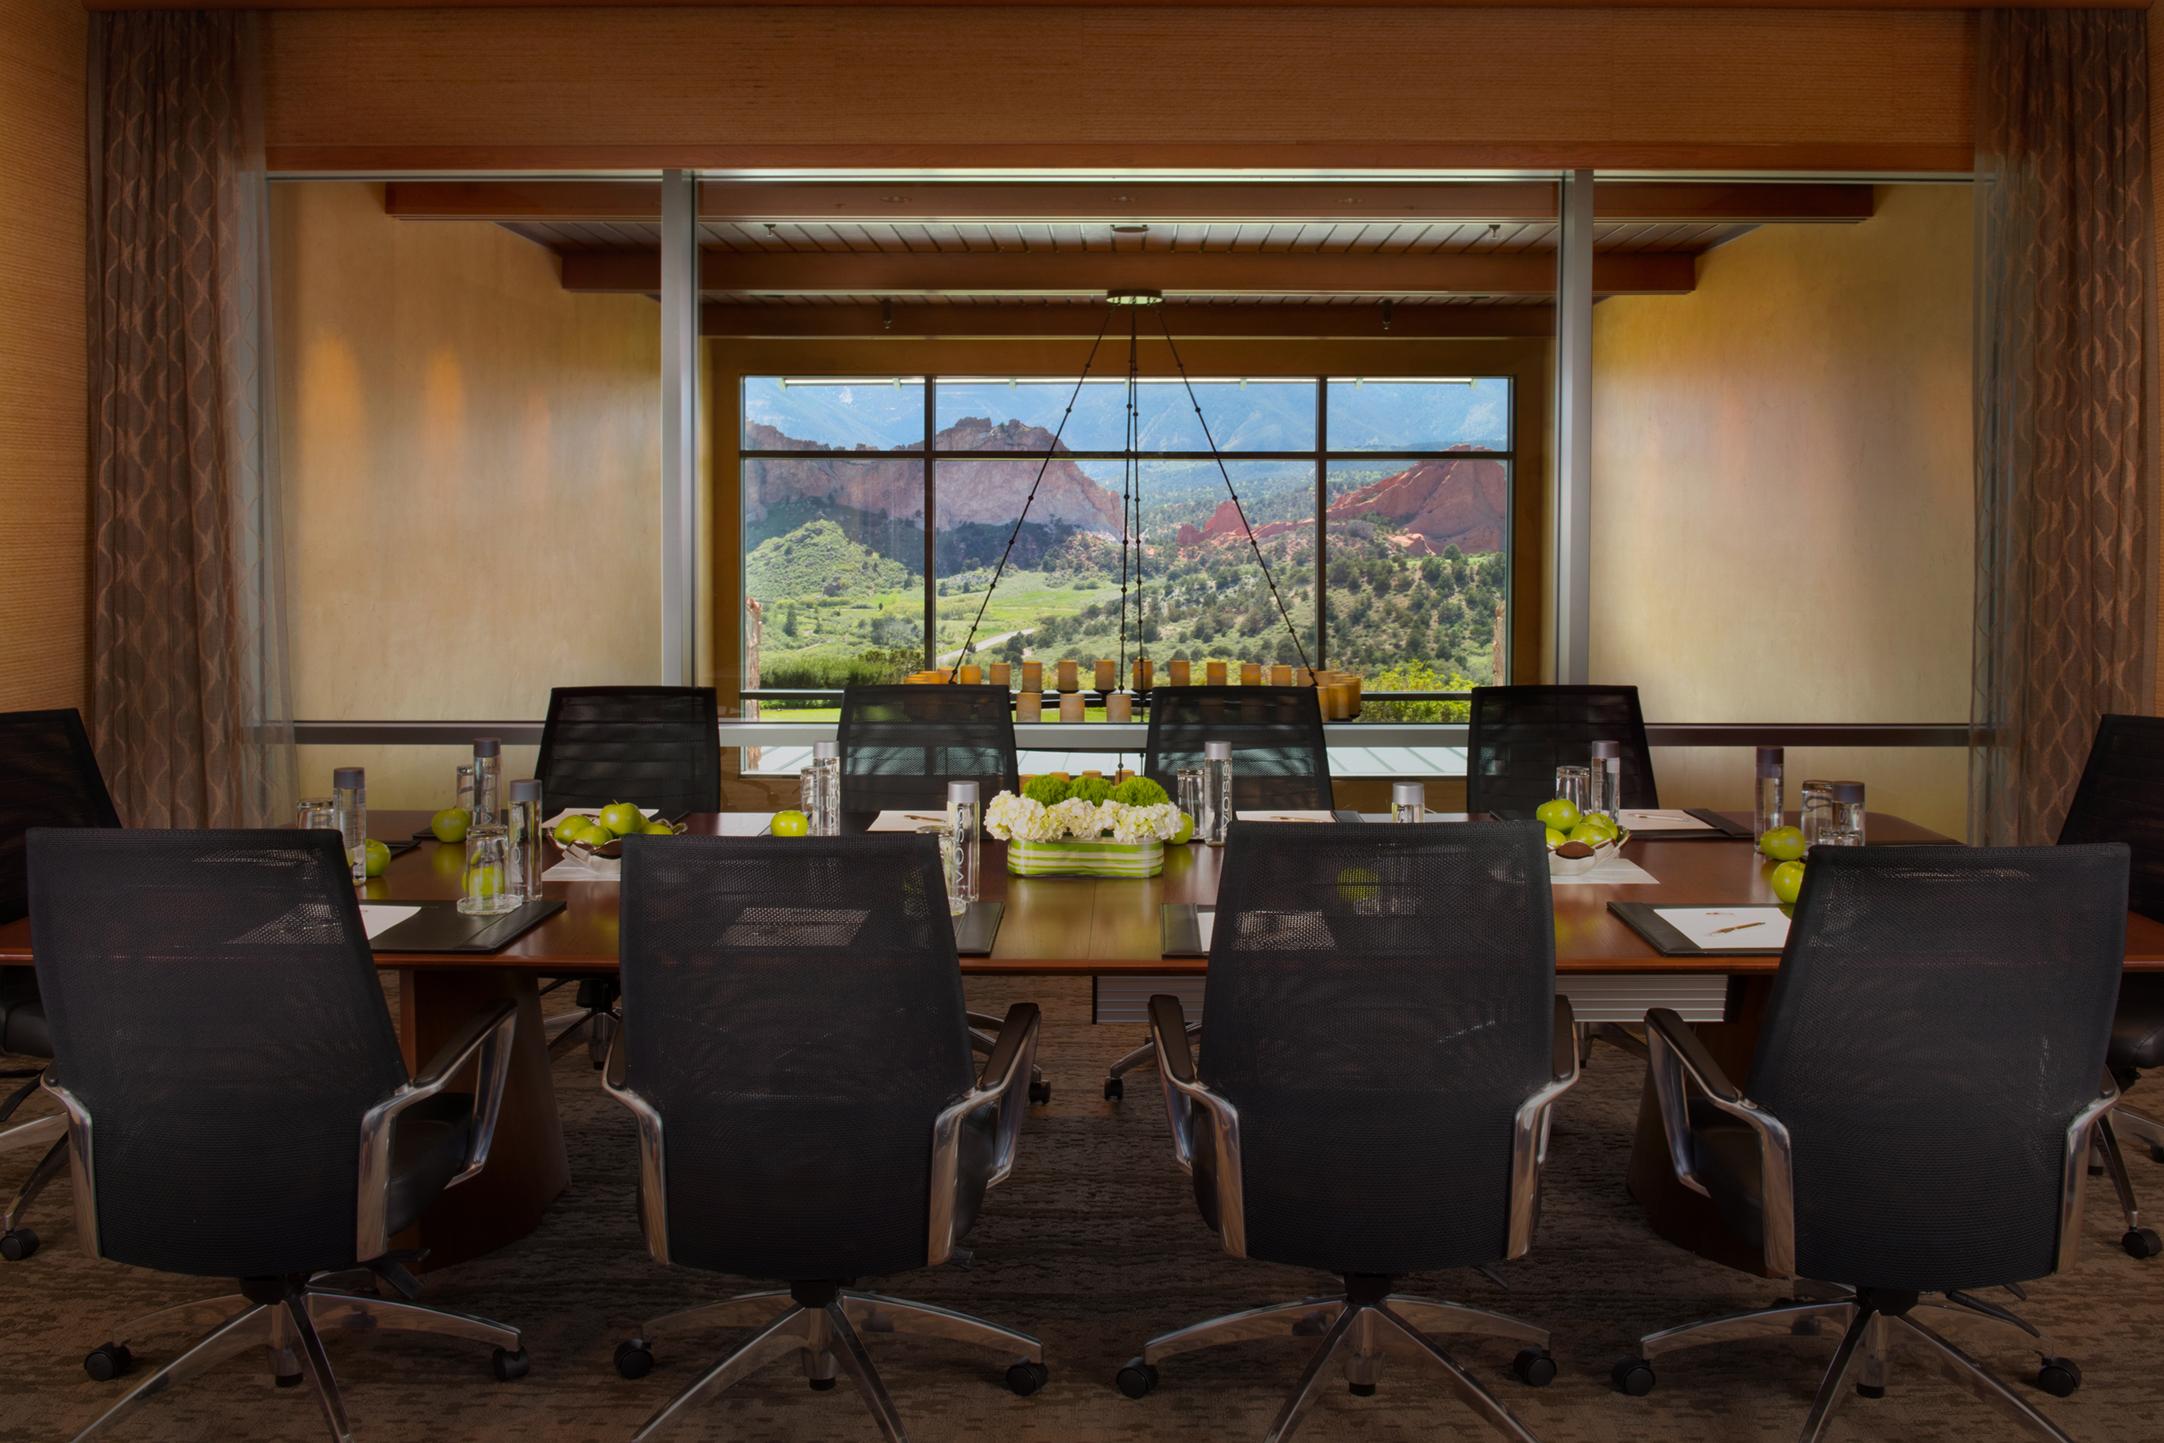 meeting and retreats room